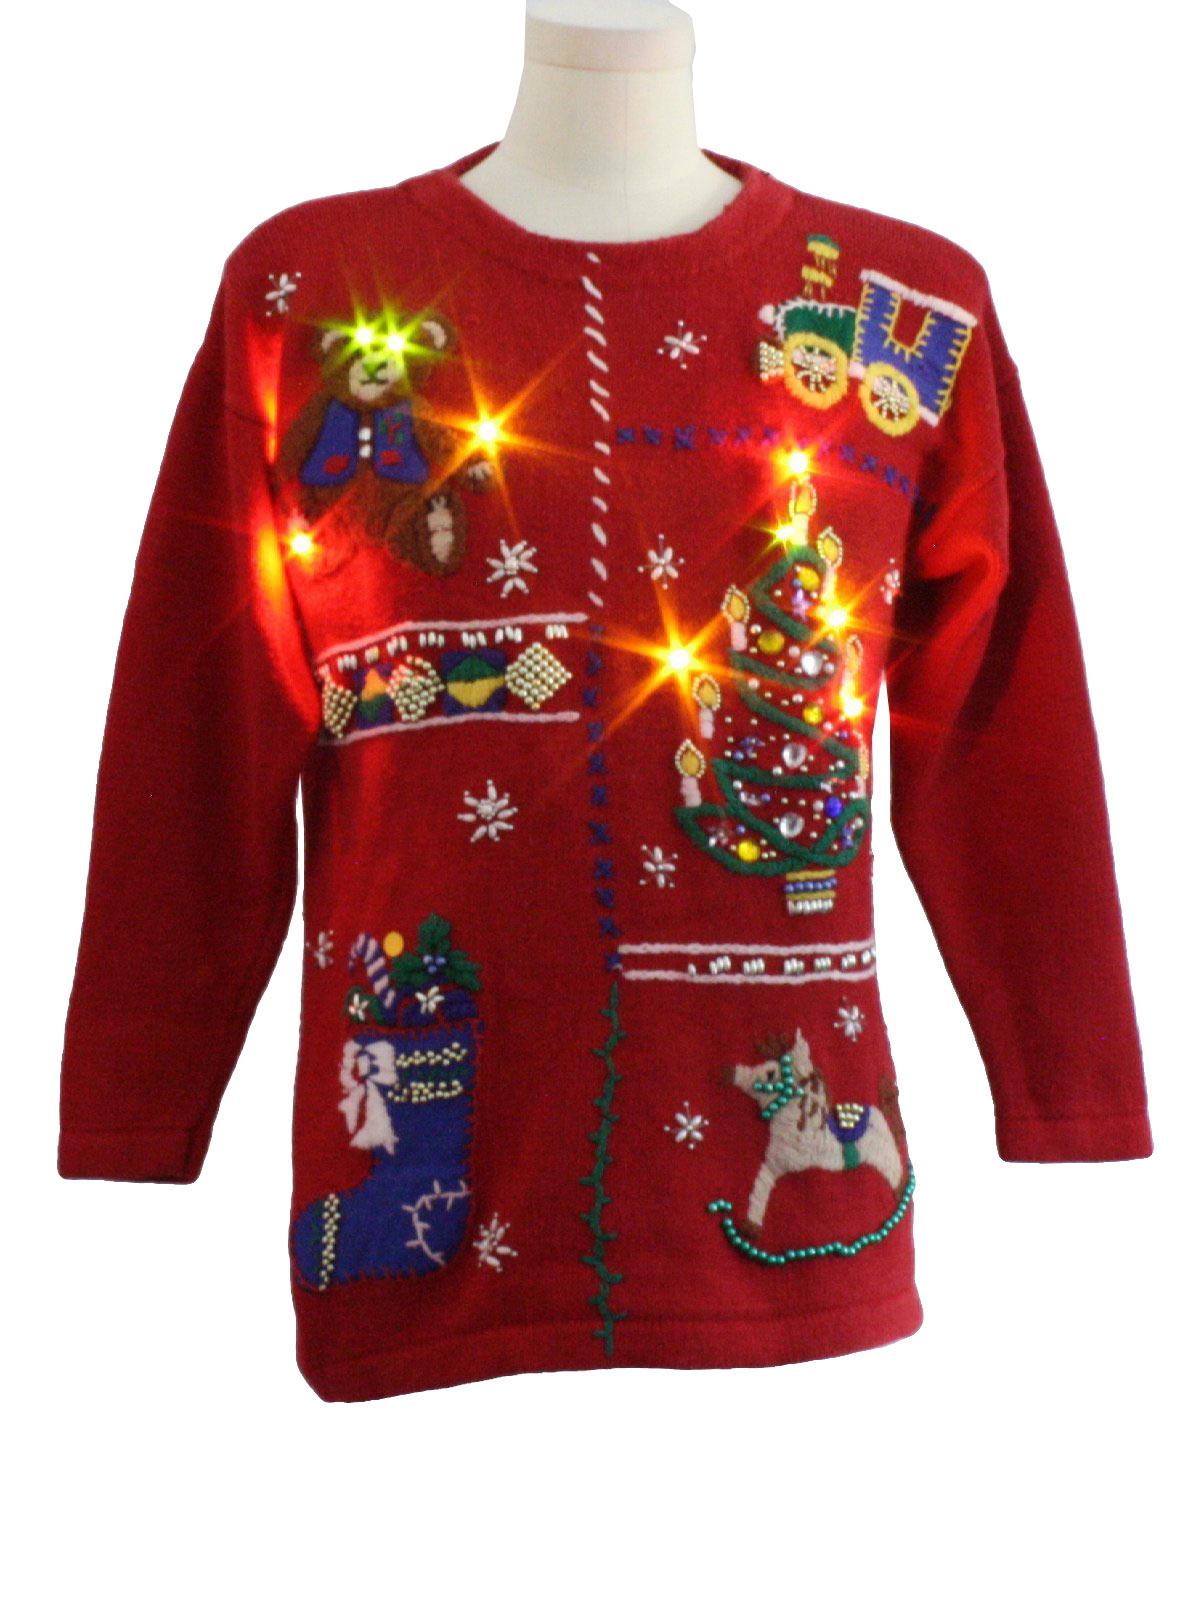 Lightup Ugly Christmas Sweater Victoria Jones Unisex